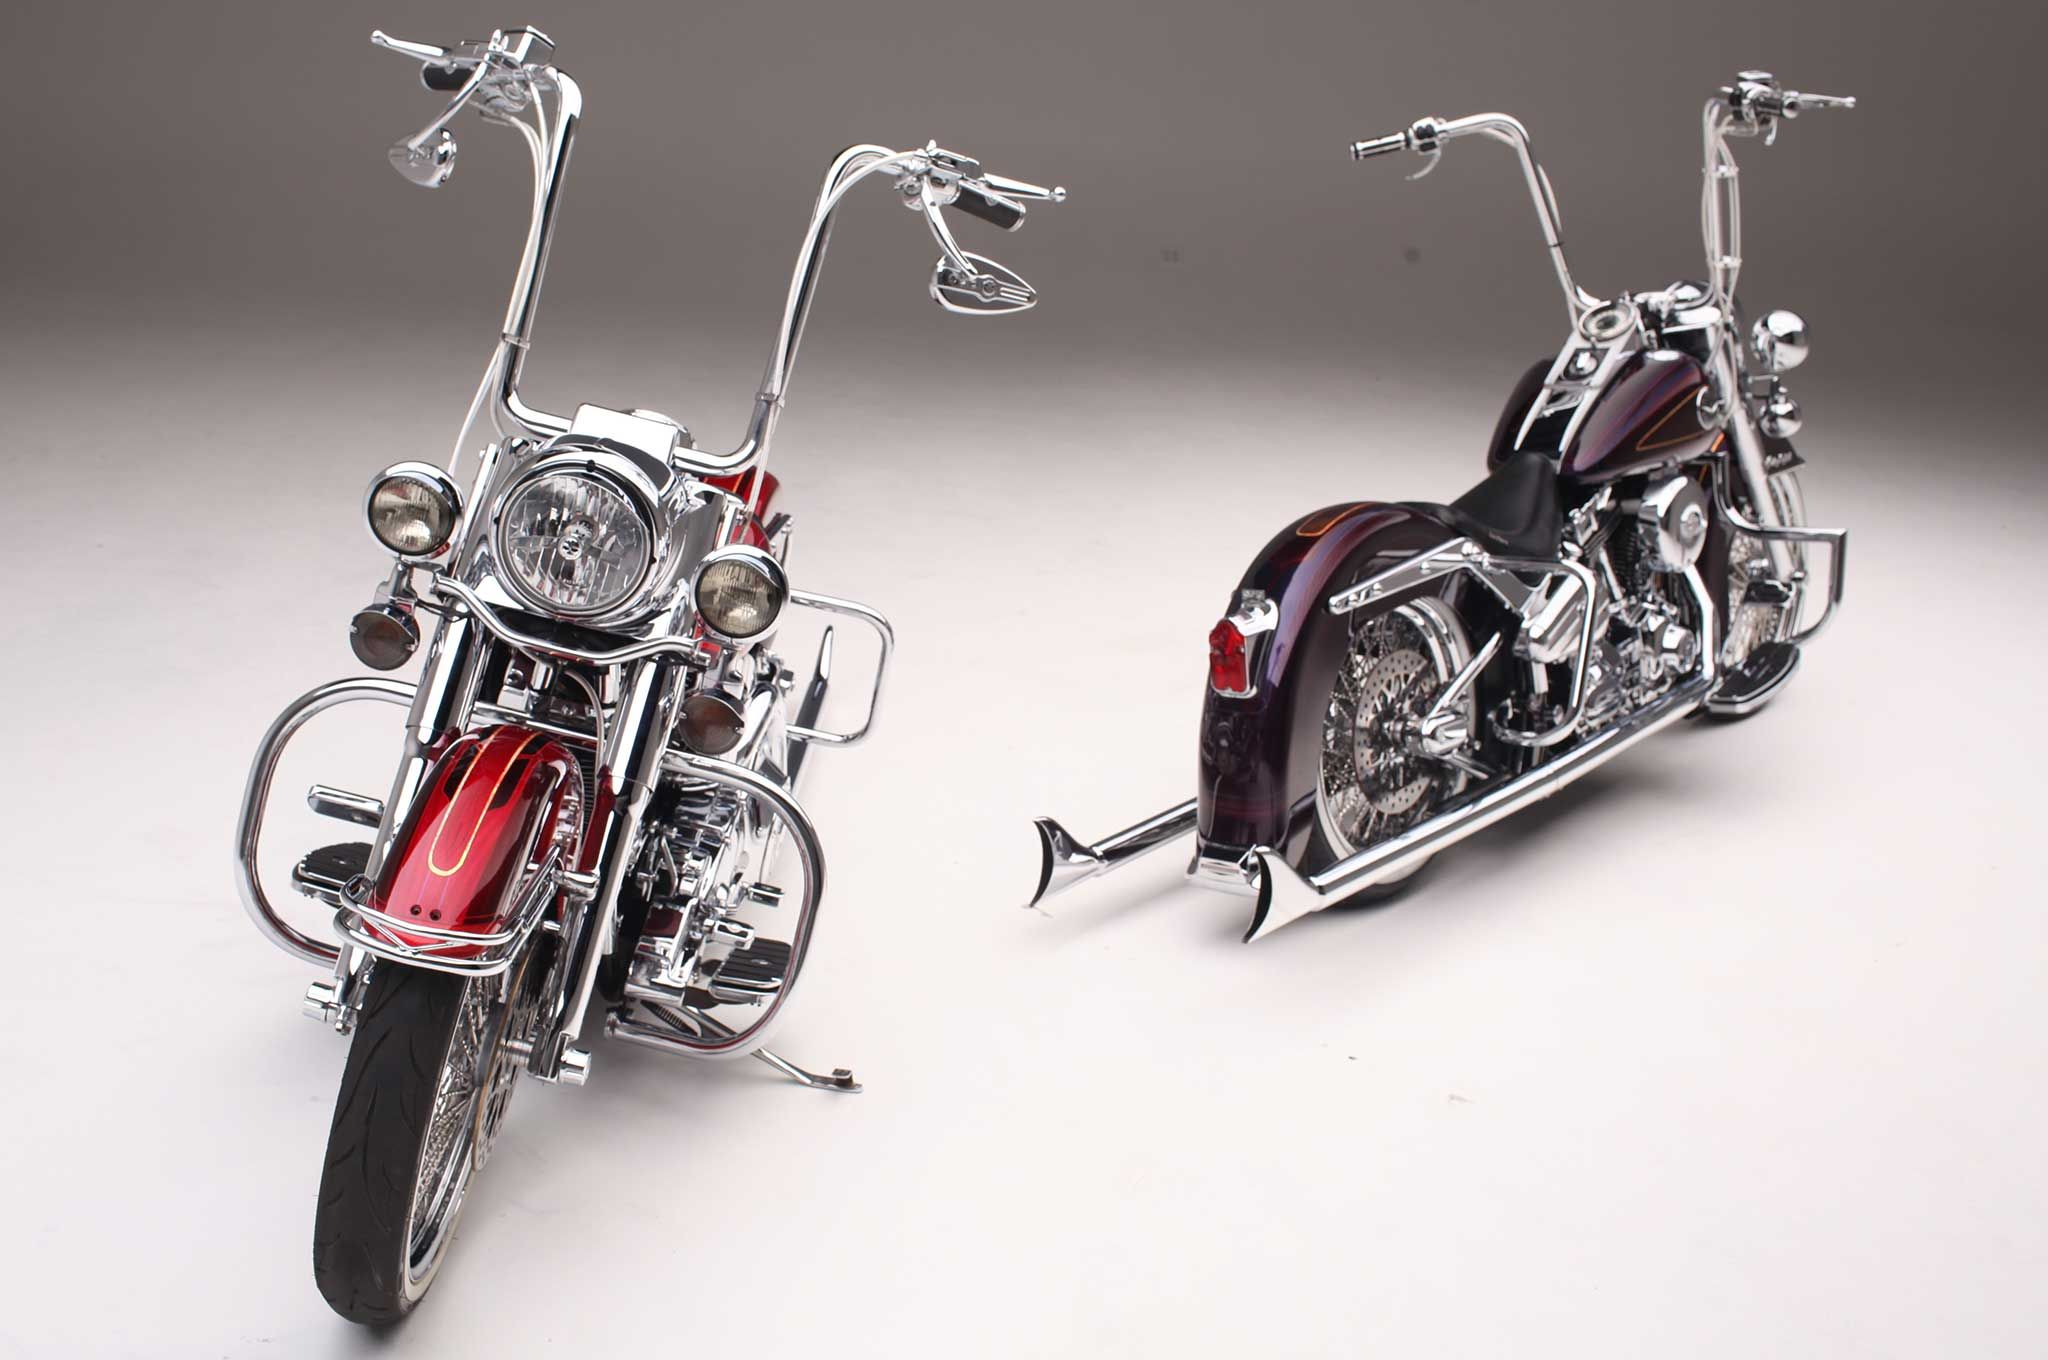 Heritage Softail Softail Deluxe Two Harleys One Painter Harley Davidson Bikes Harley Davidson Men Harley Davidson Pictures [ 1360 x 2048 Pixel ]